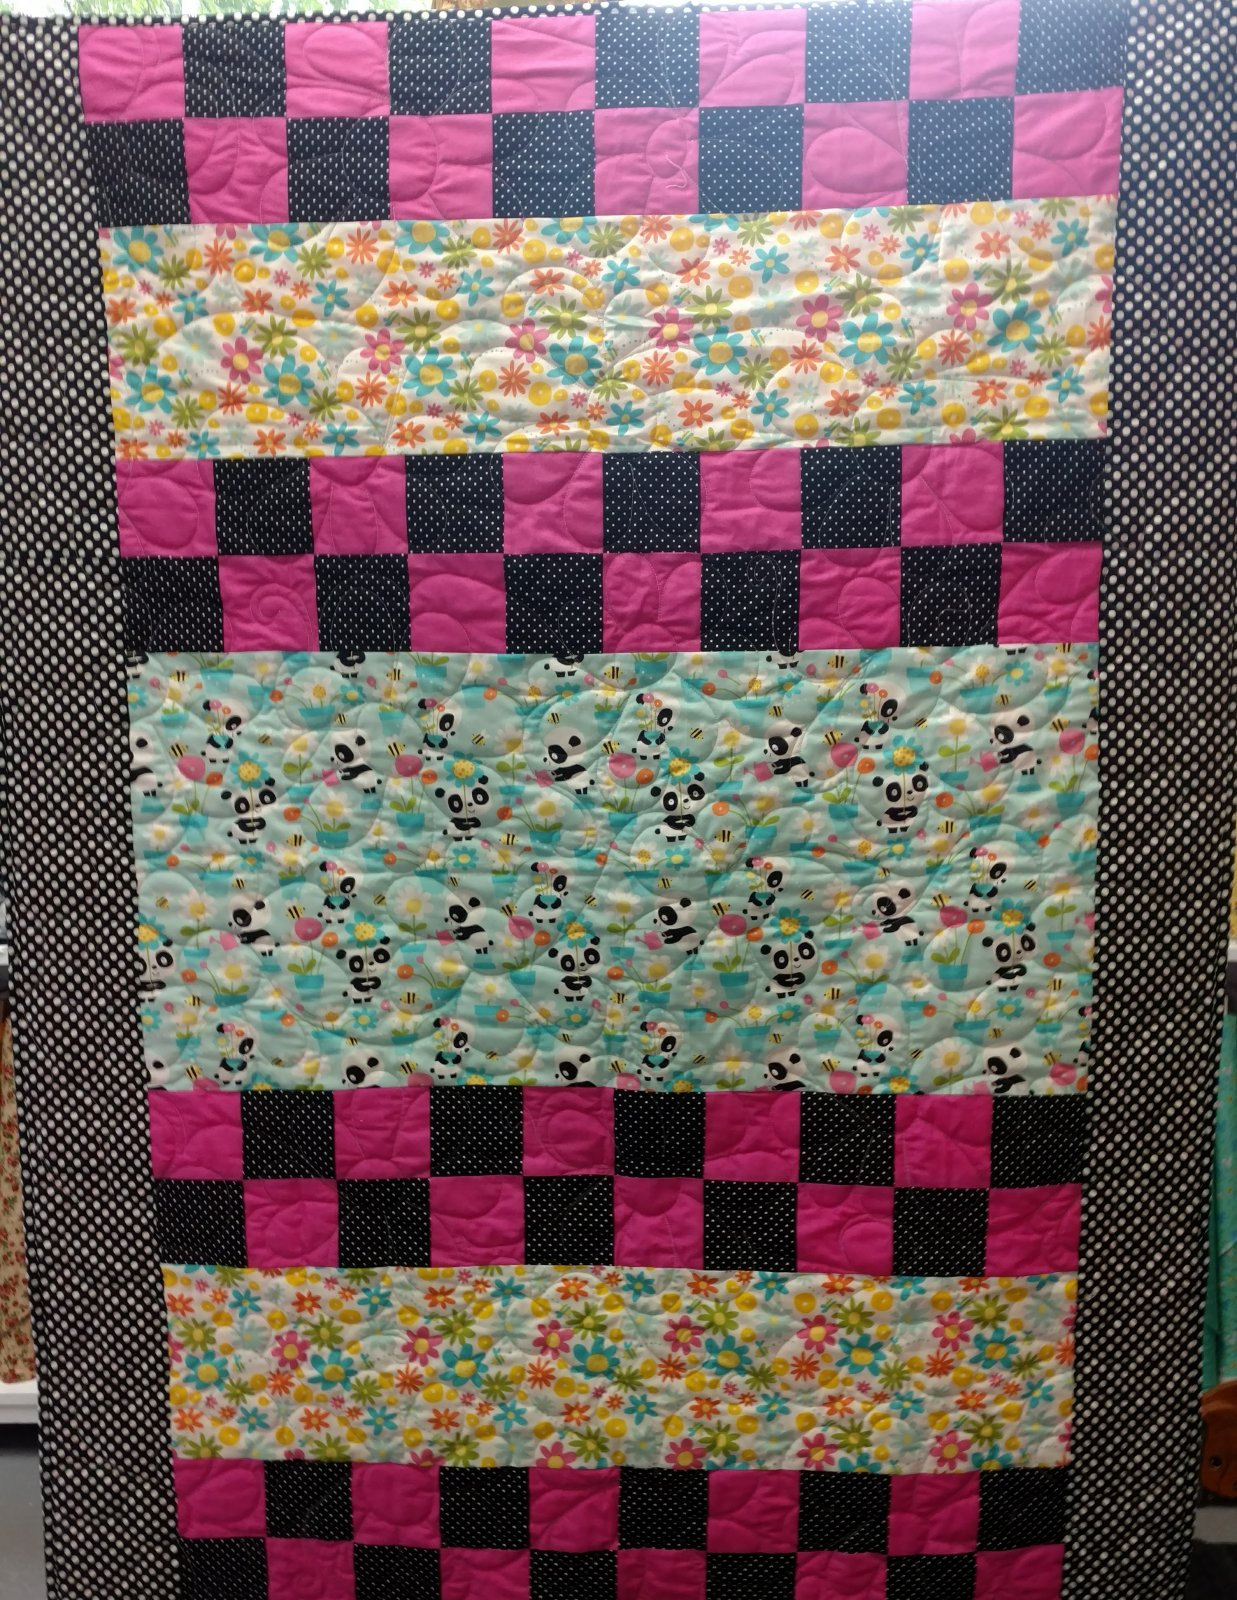 Gingersnap Quilt Kit in Panda Fabric